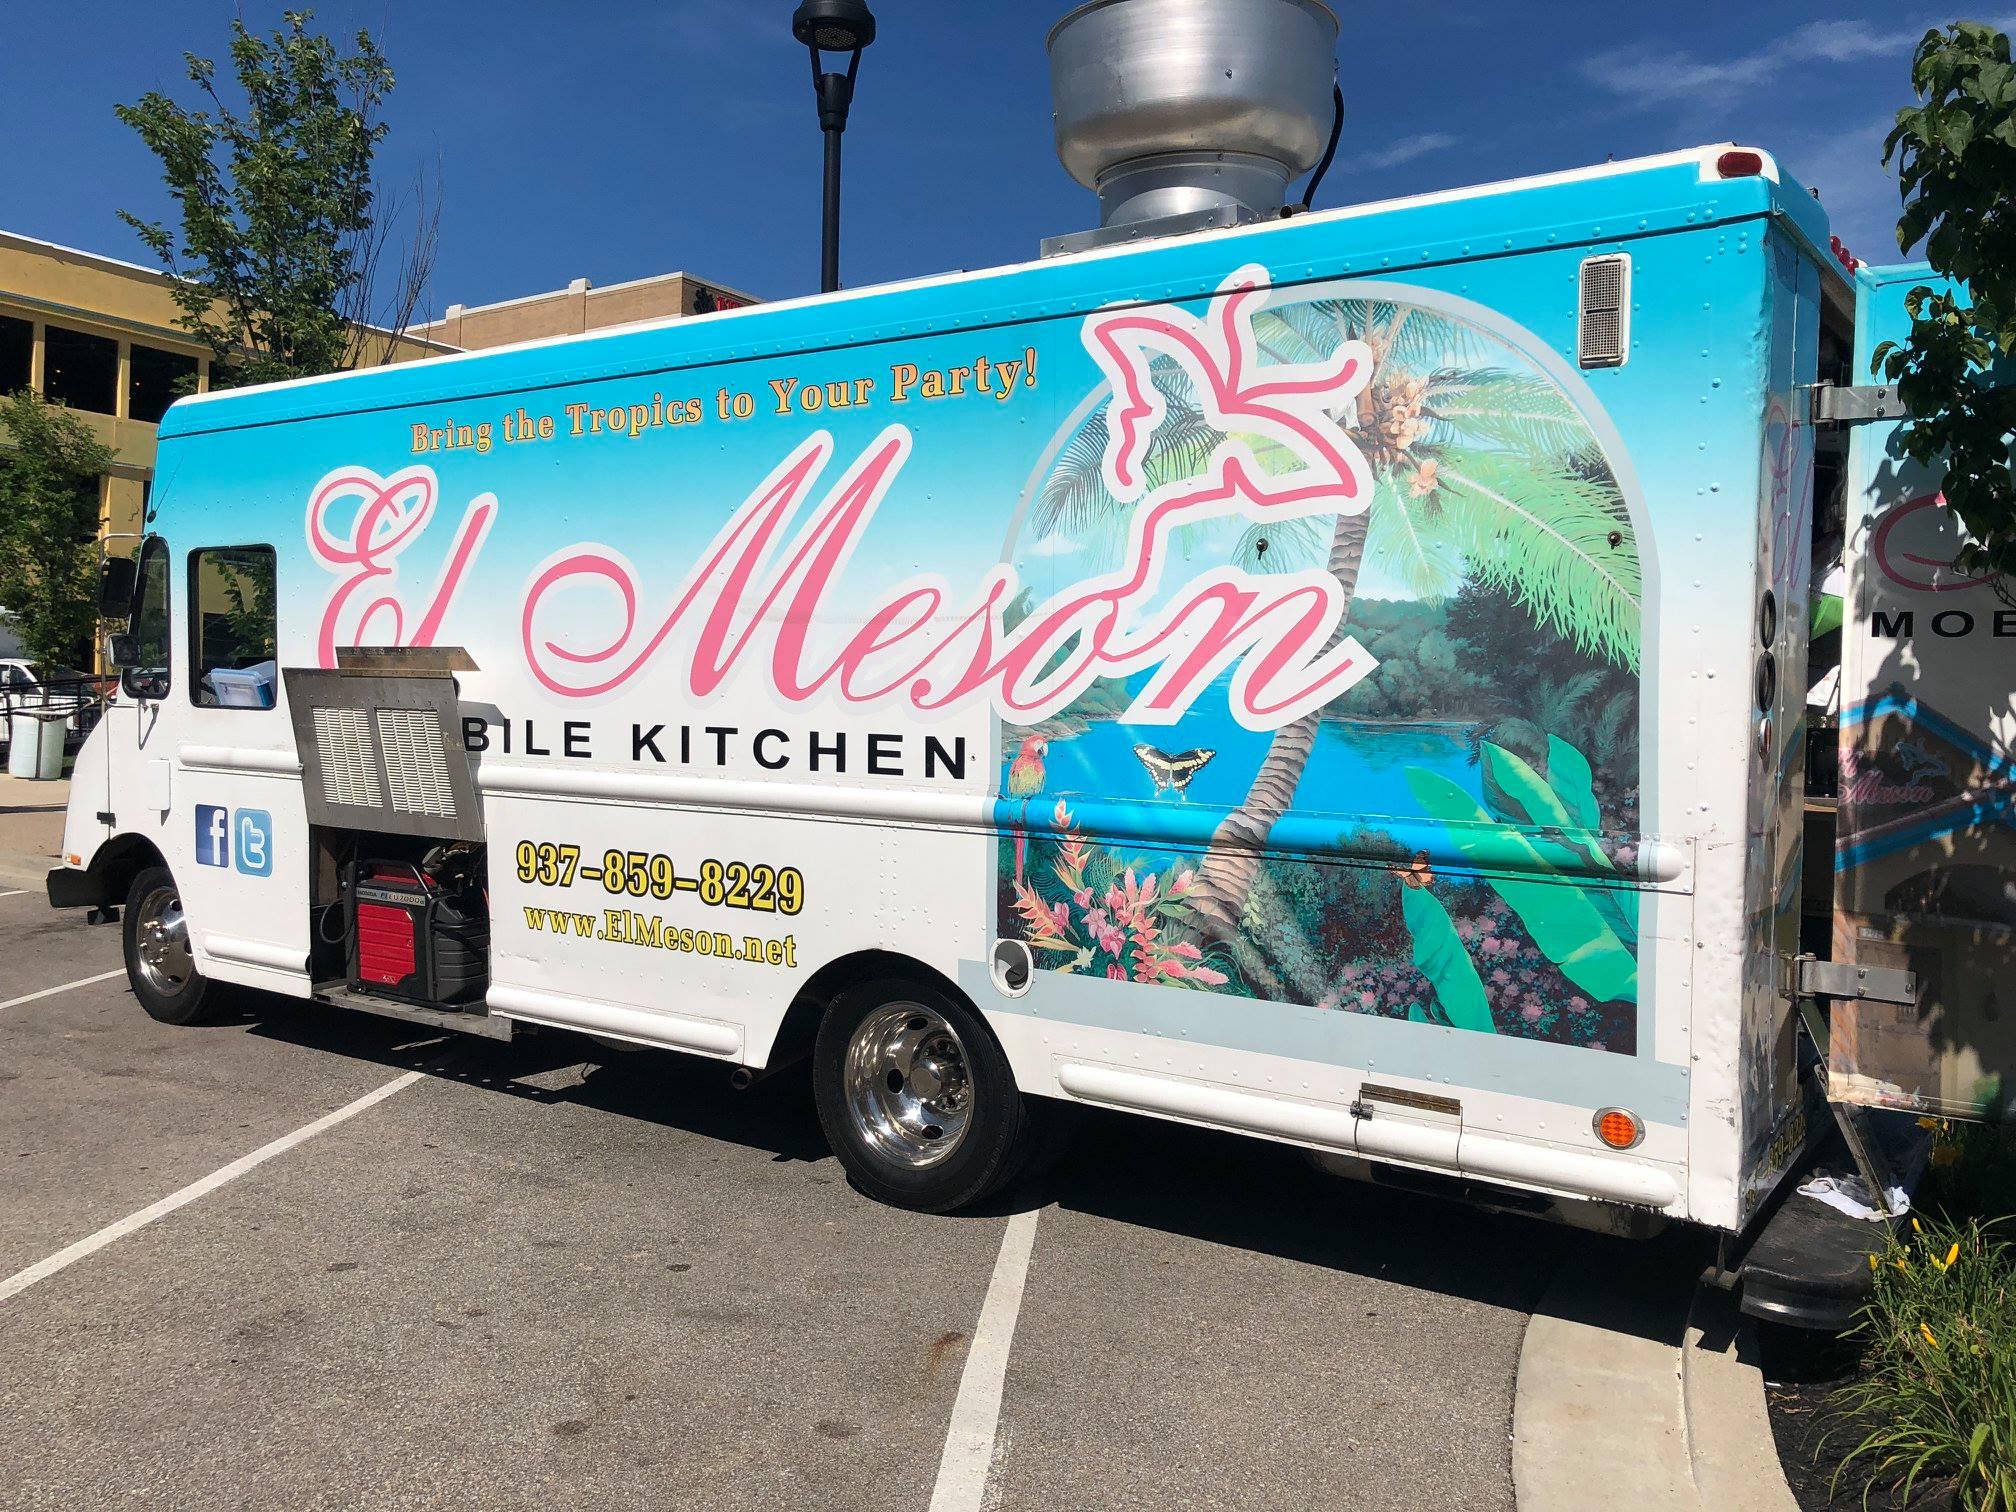 Food Truck Dayton